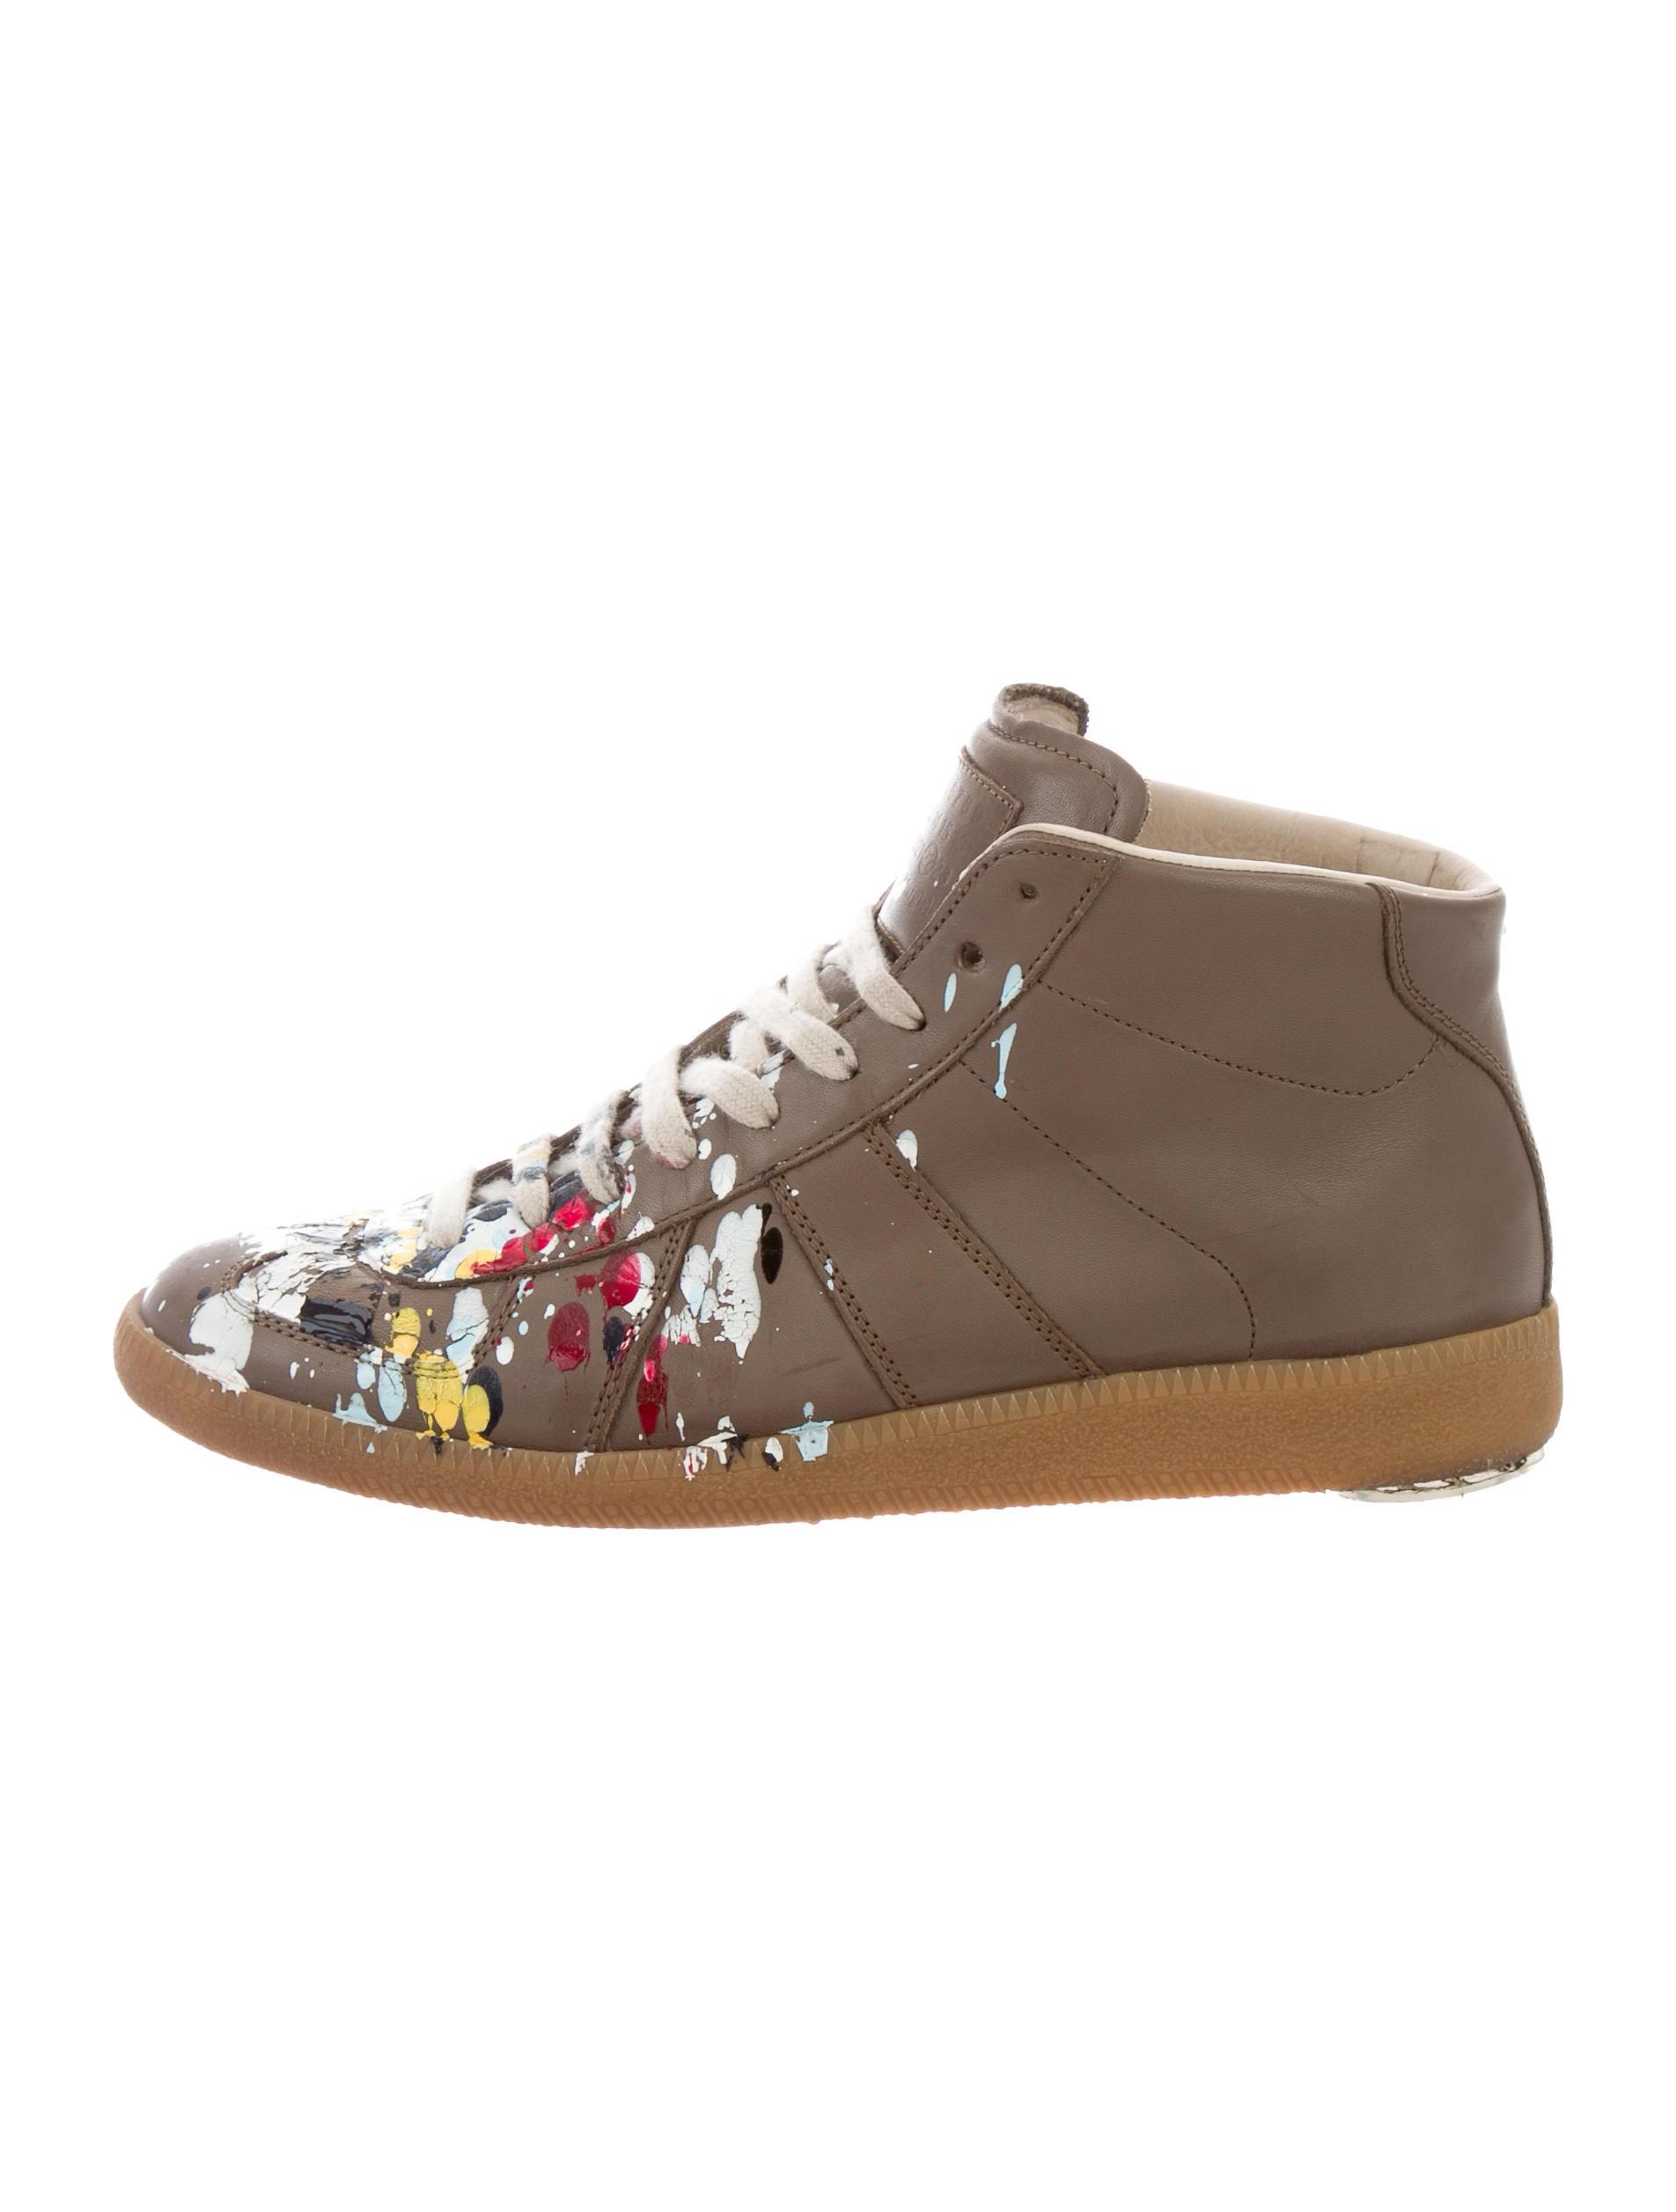 a146491938ea Maison Margiela Paint Splatter Replica Sneakers - Shoes - MAI30817 ...